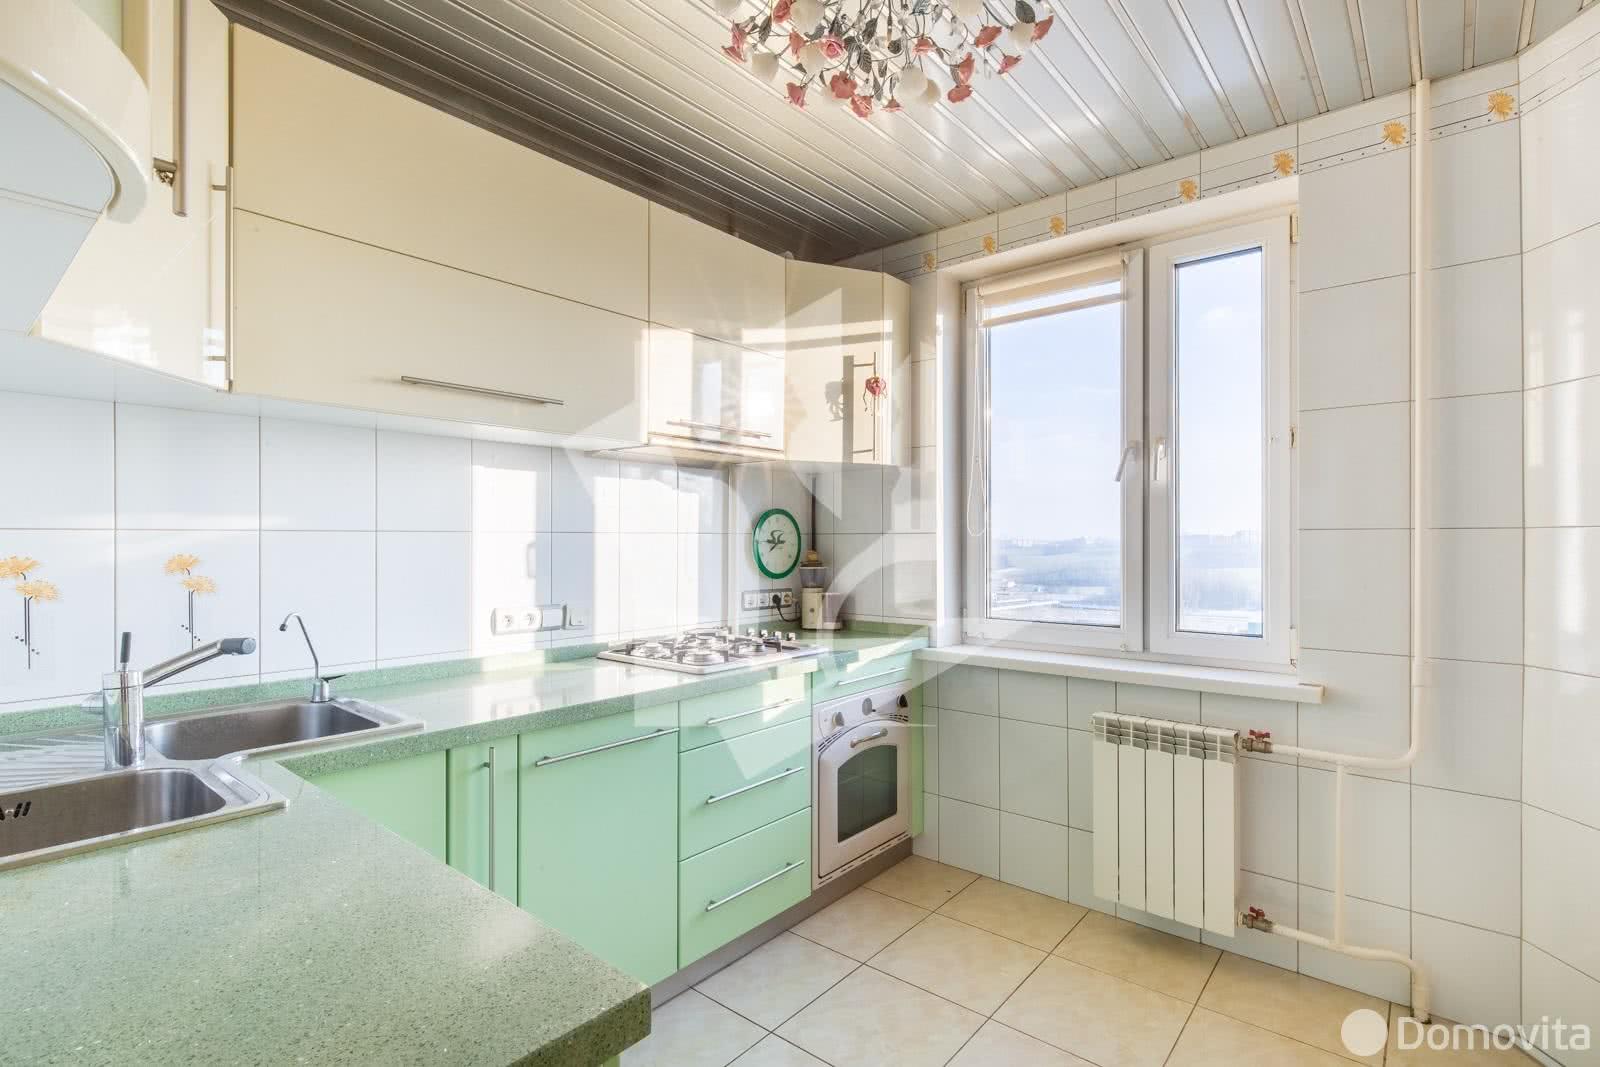 Купить 4-комнатную квартиру в Минске, ул. Пимена Панченко, д. 24 - фото 4